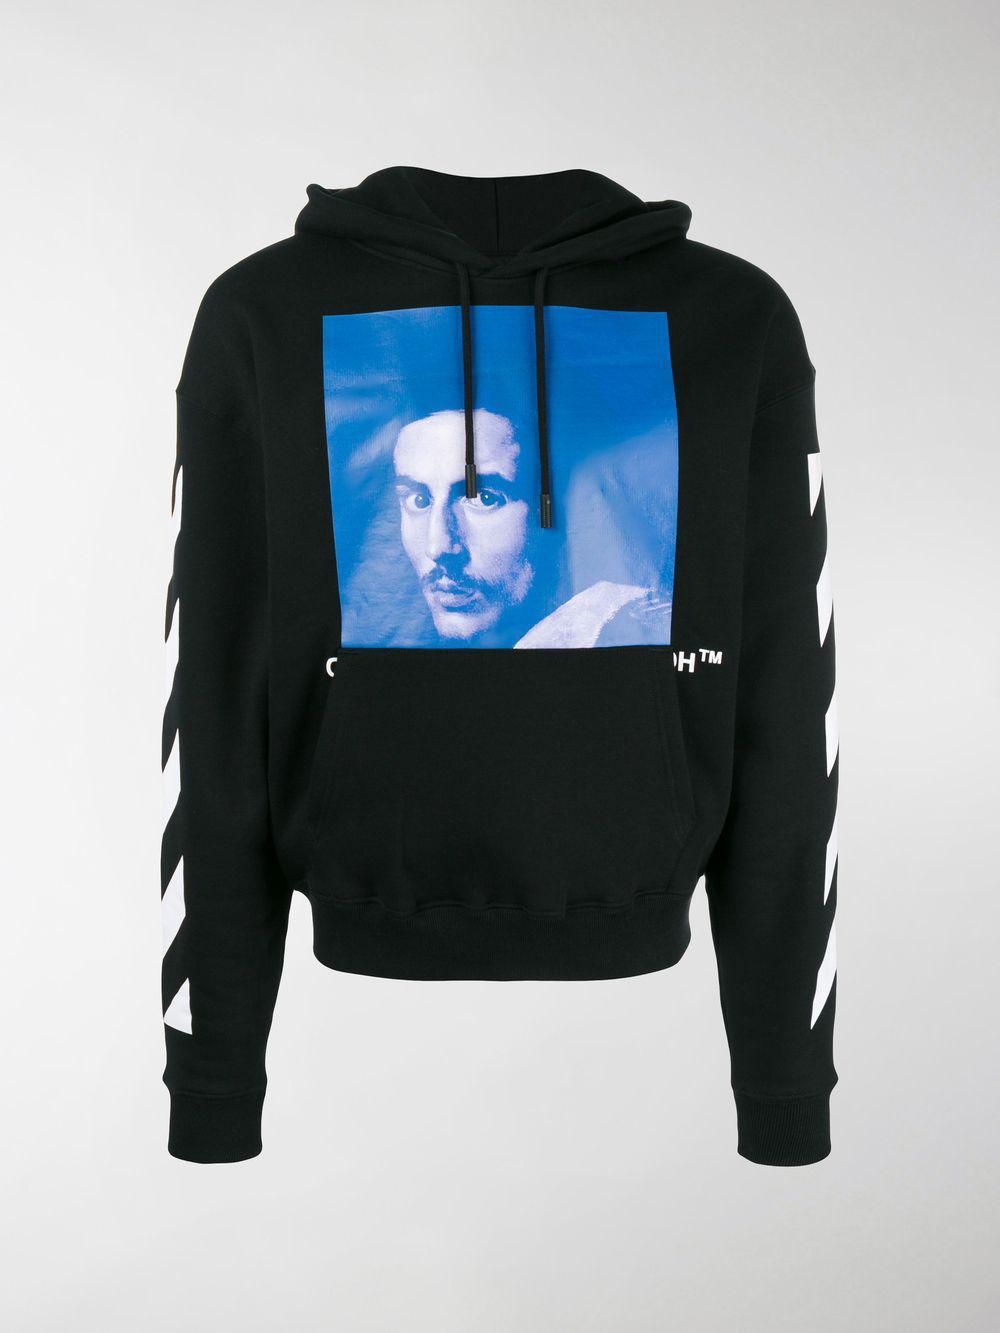 Off-White C O Virgil Abloh Bernini Print Hoodie in Black for Men - Lyst deb27ad32